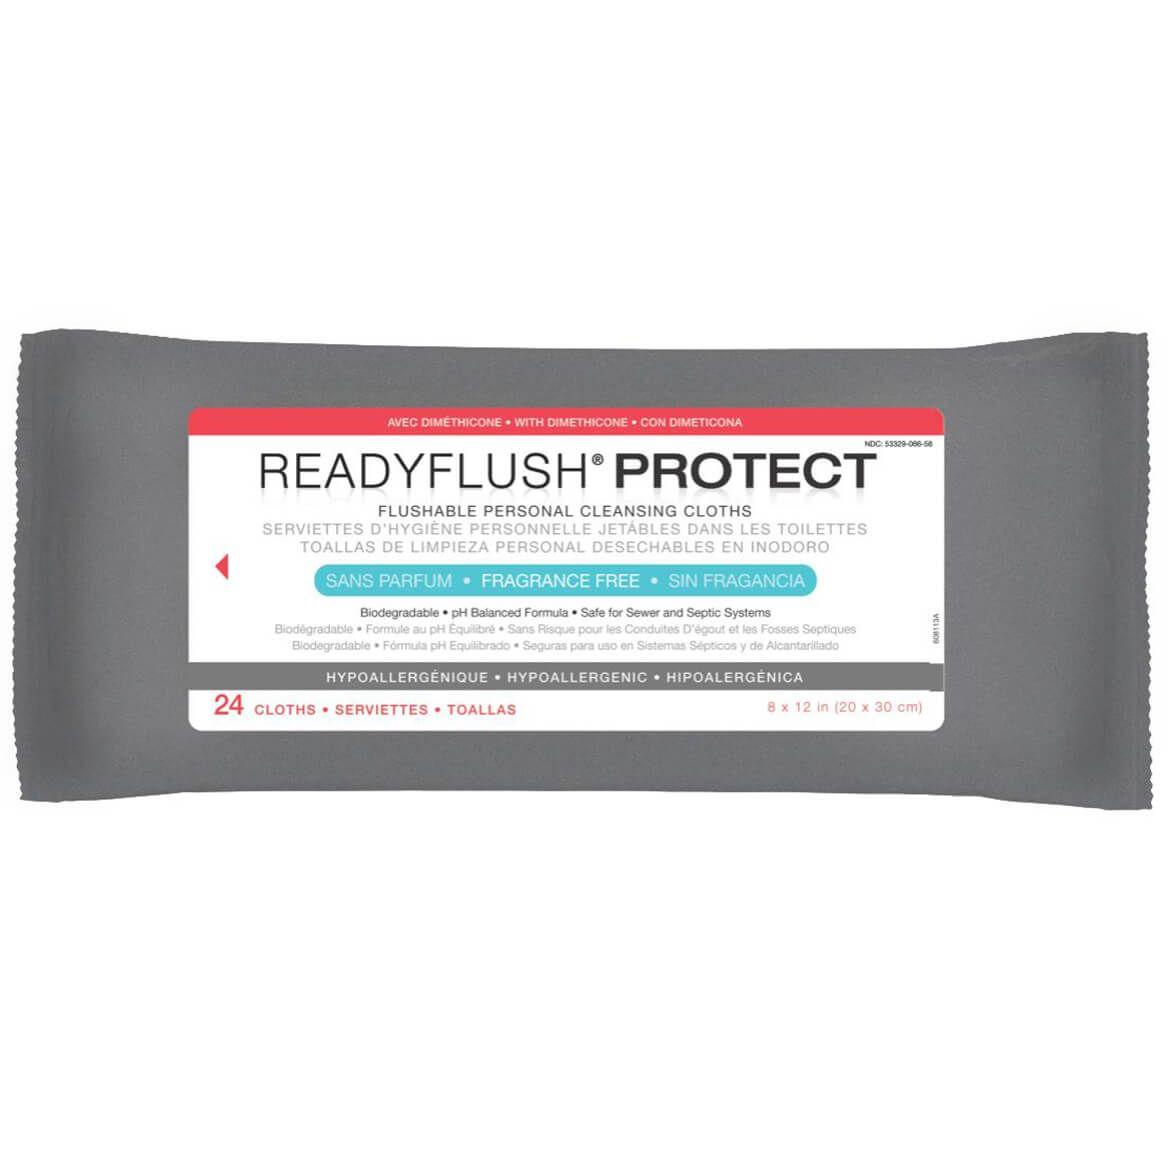 ReadyFlush Protect Skin Protectant Wipes-351479